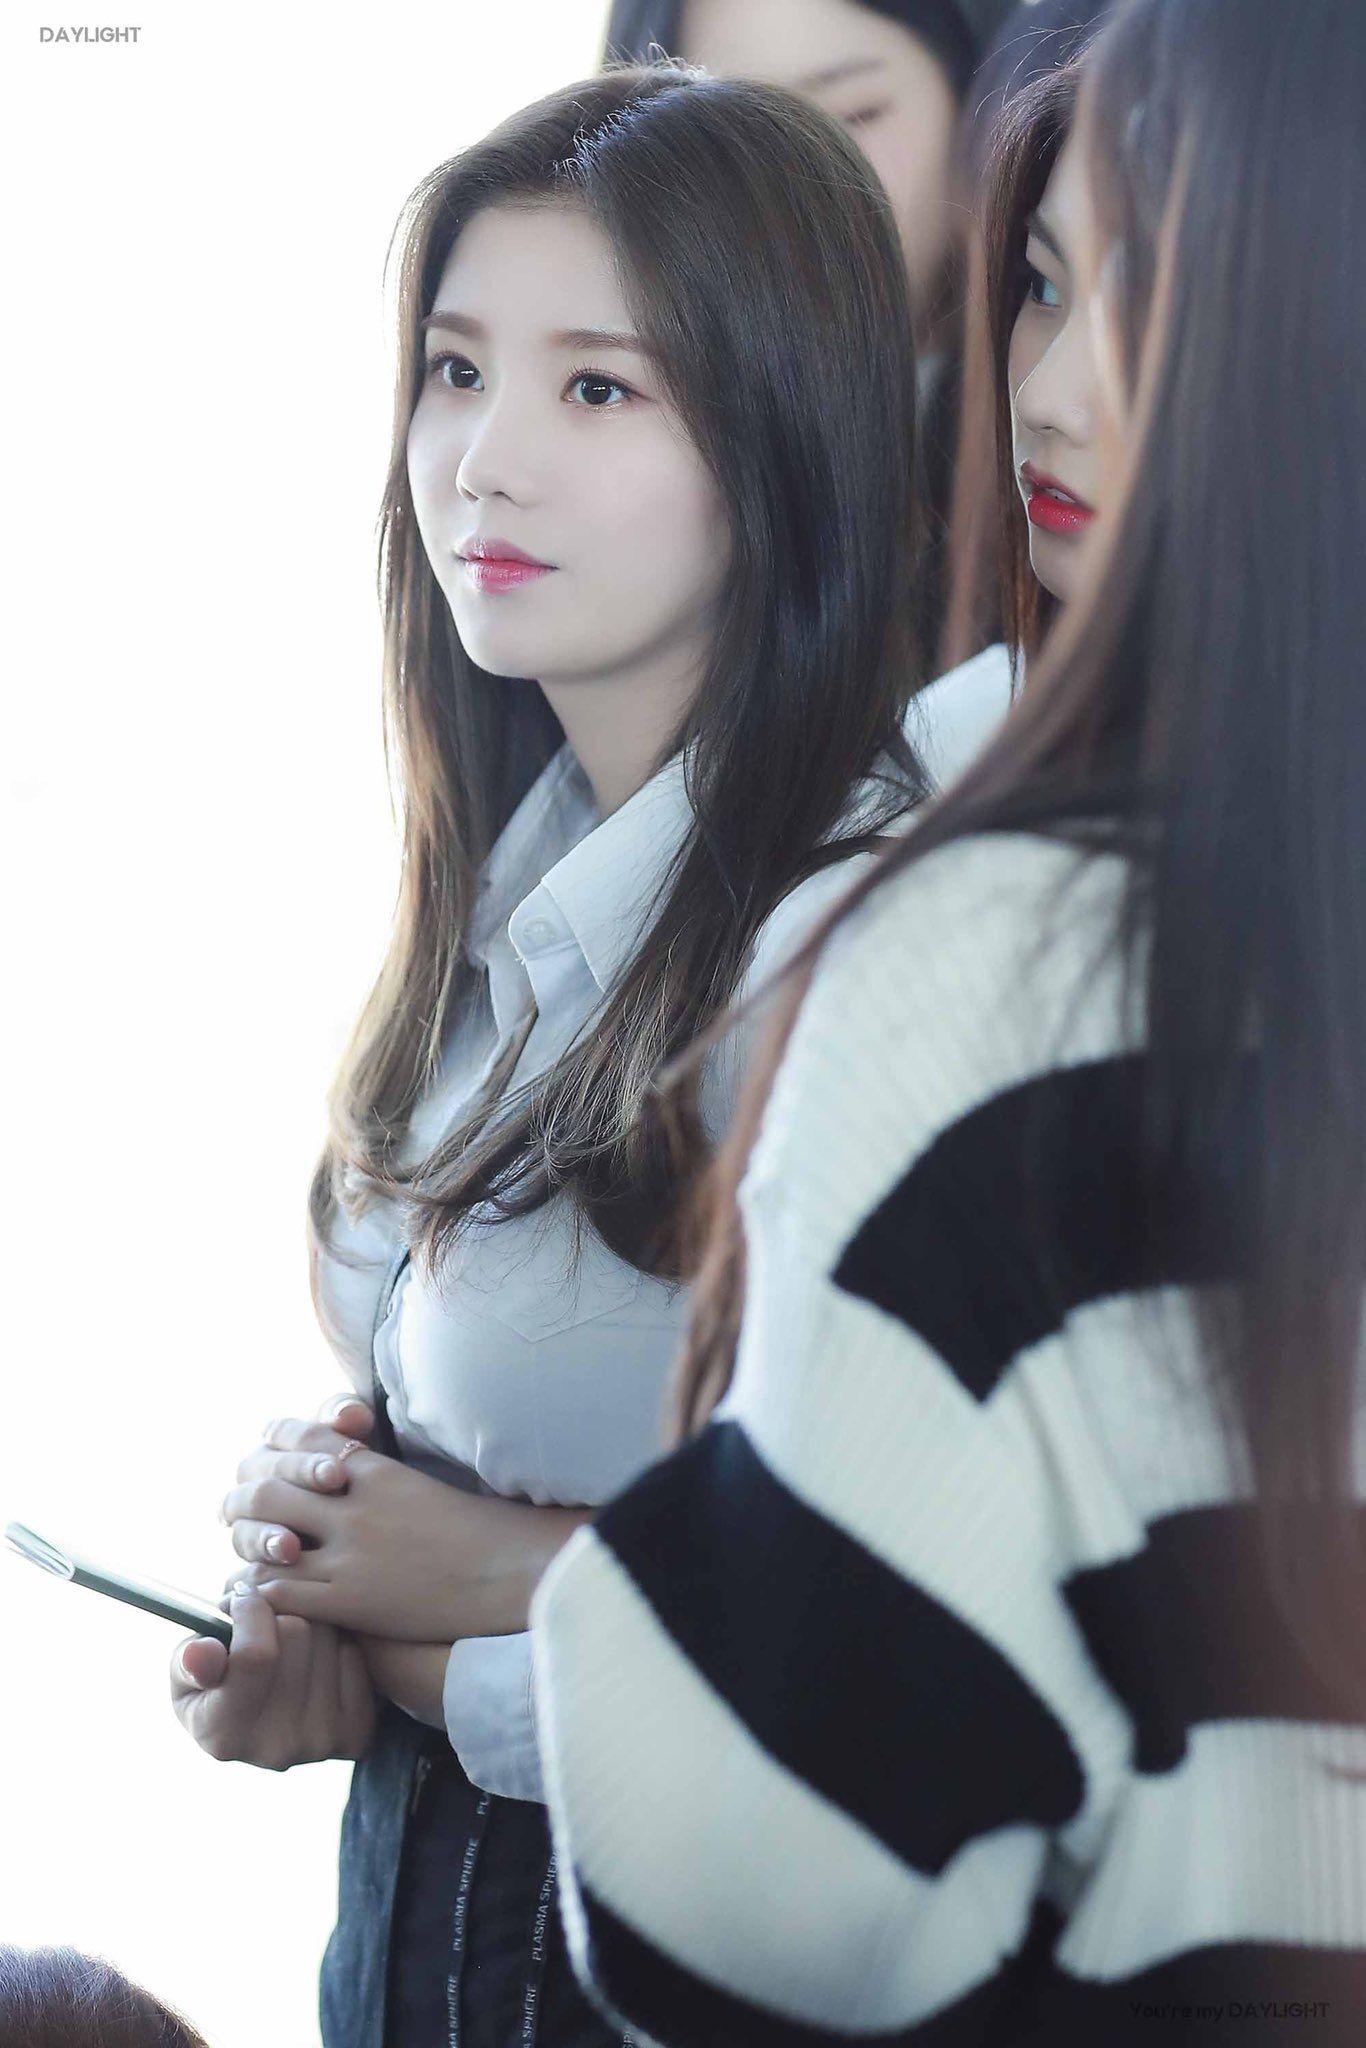 Kwon Eunbi | Kwon Eunbi (IZ*ONE) di 2019